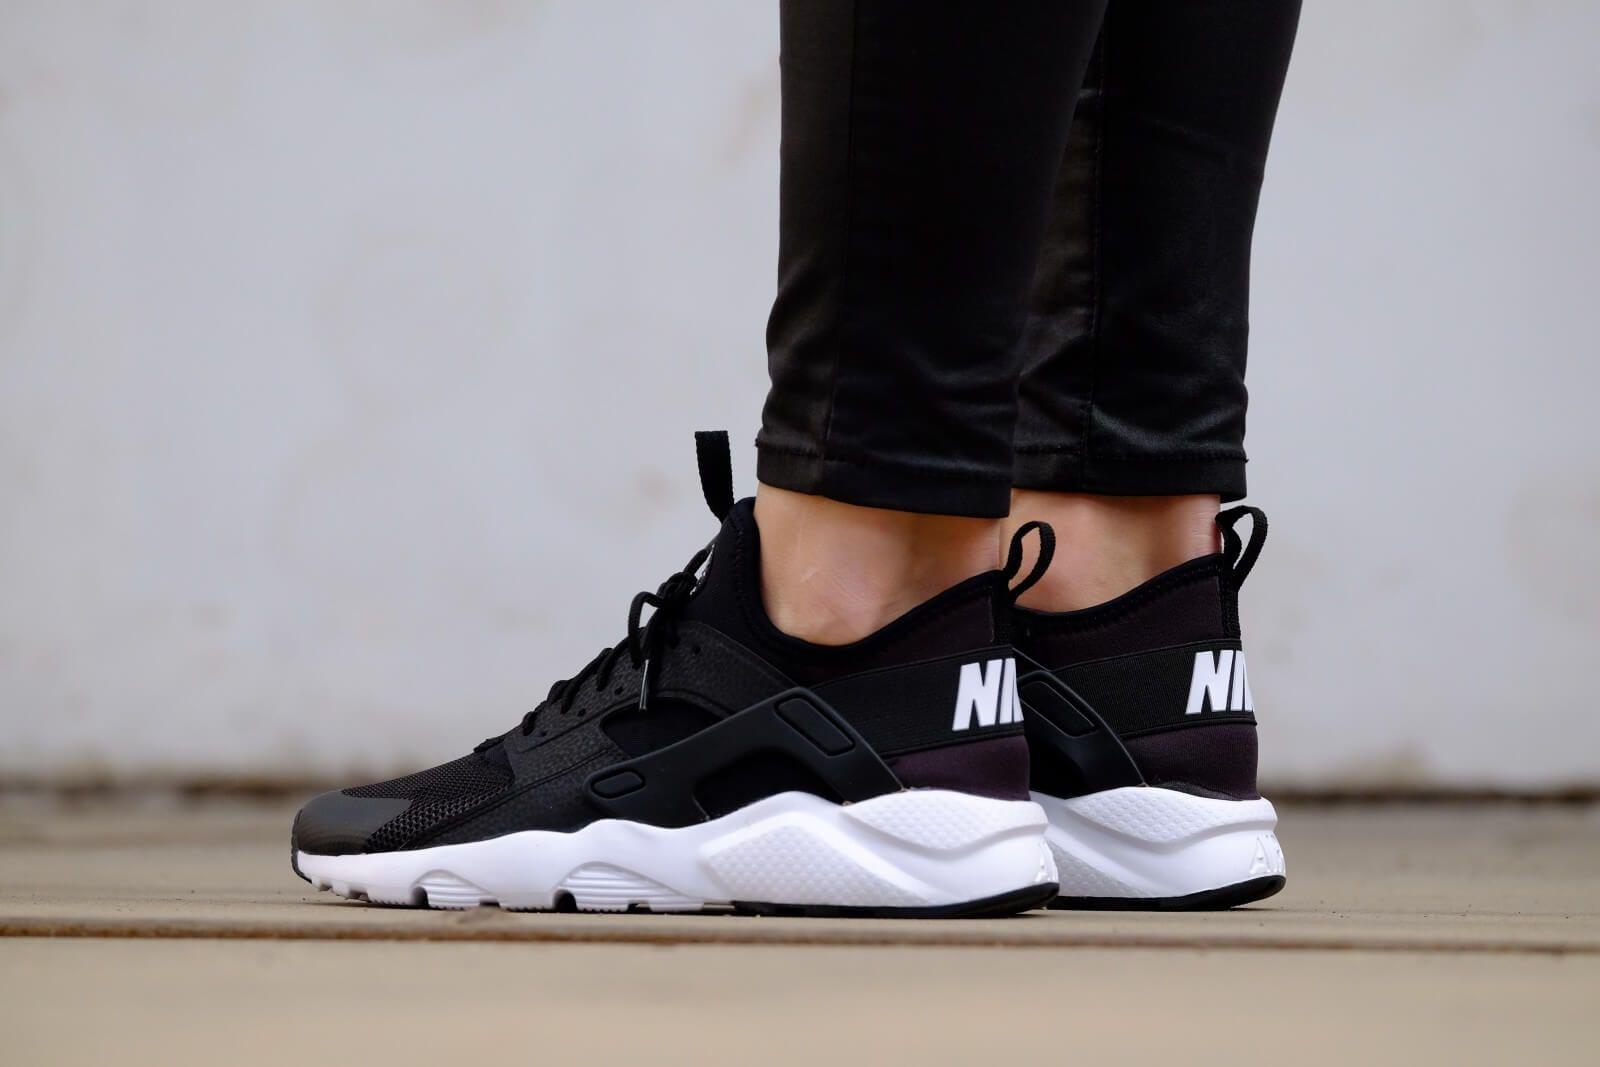 Sofisticado árabe Disminución  Nike Air Huarache Ultra Black And White | Nike air huarache black, Nike air  huarache, White gym shoes